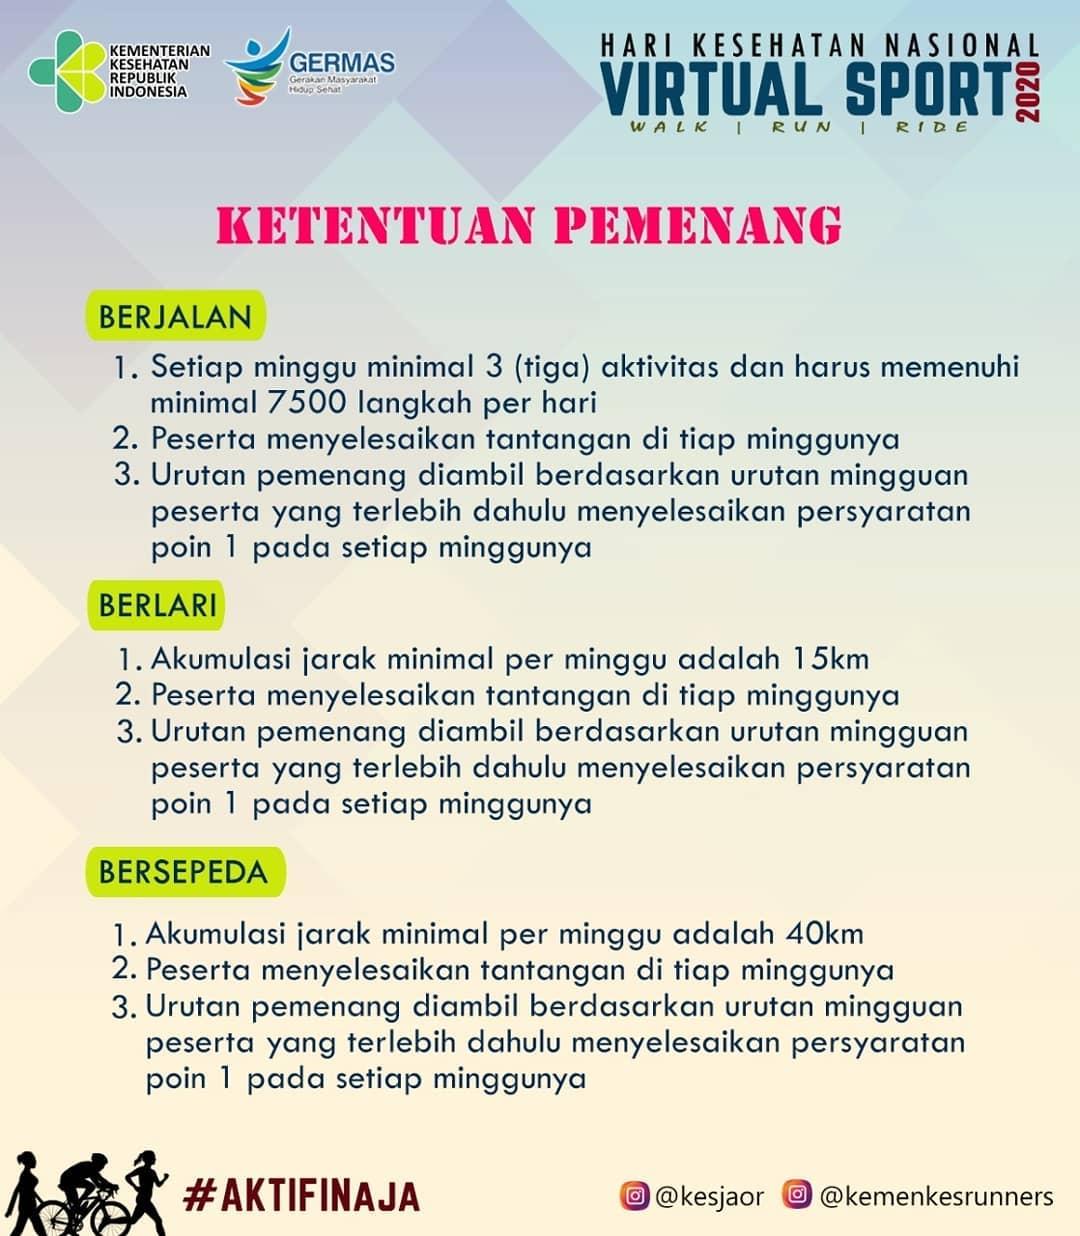 HKN Virtual Sport • 2020